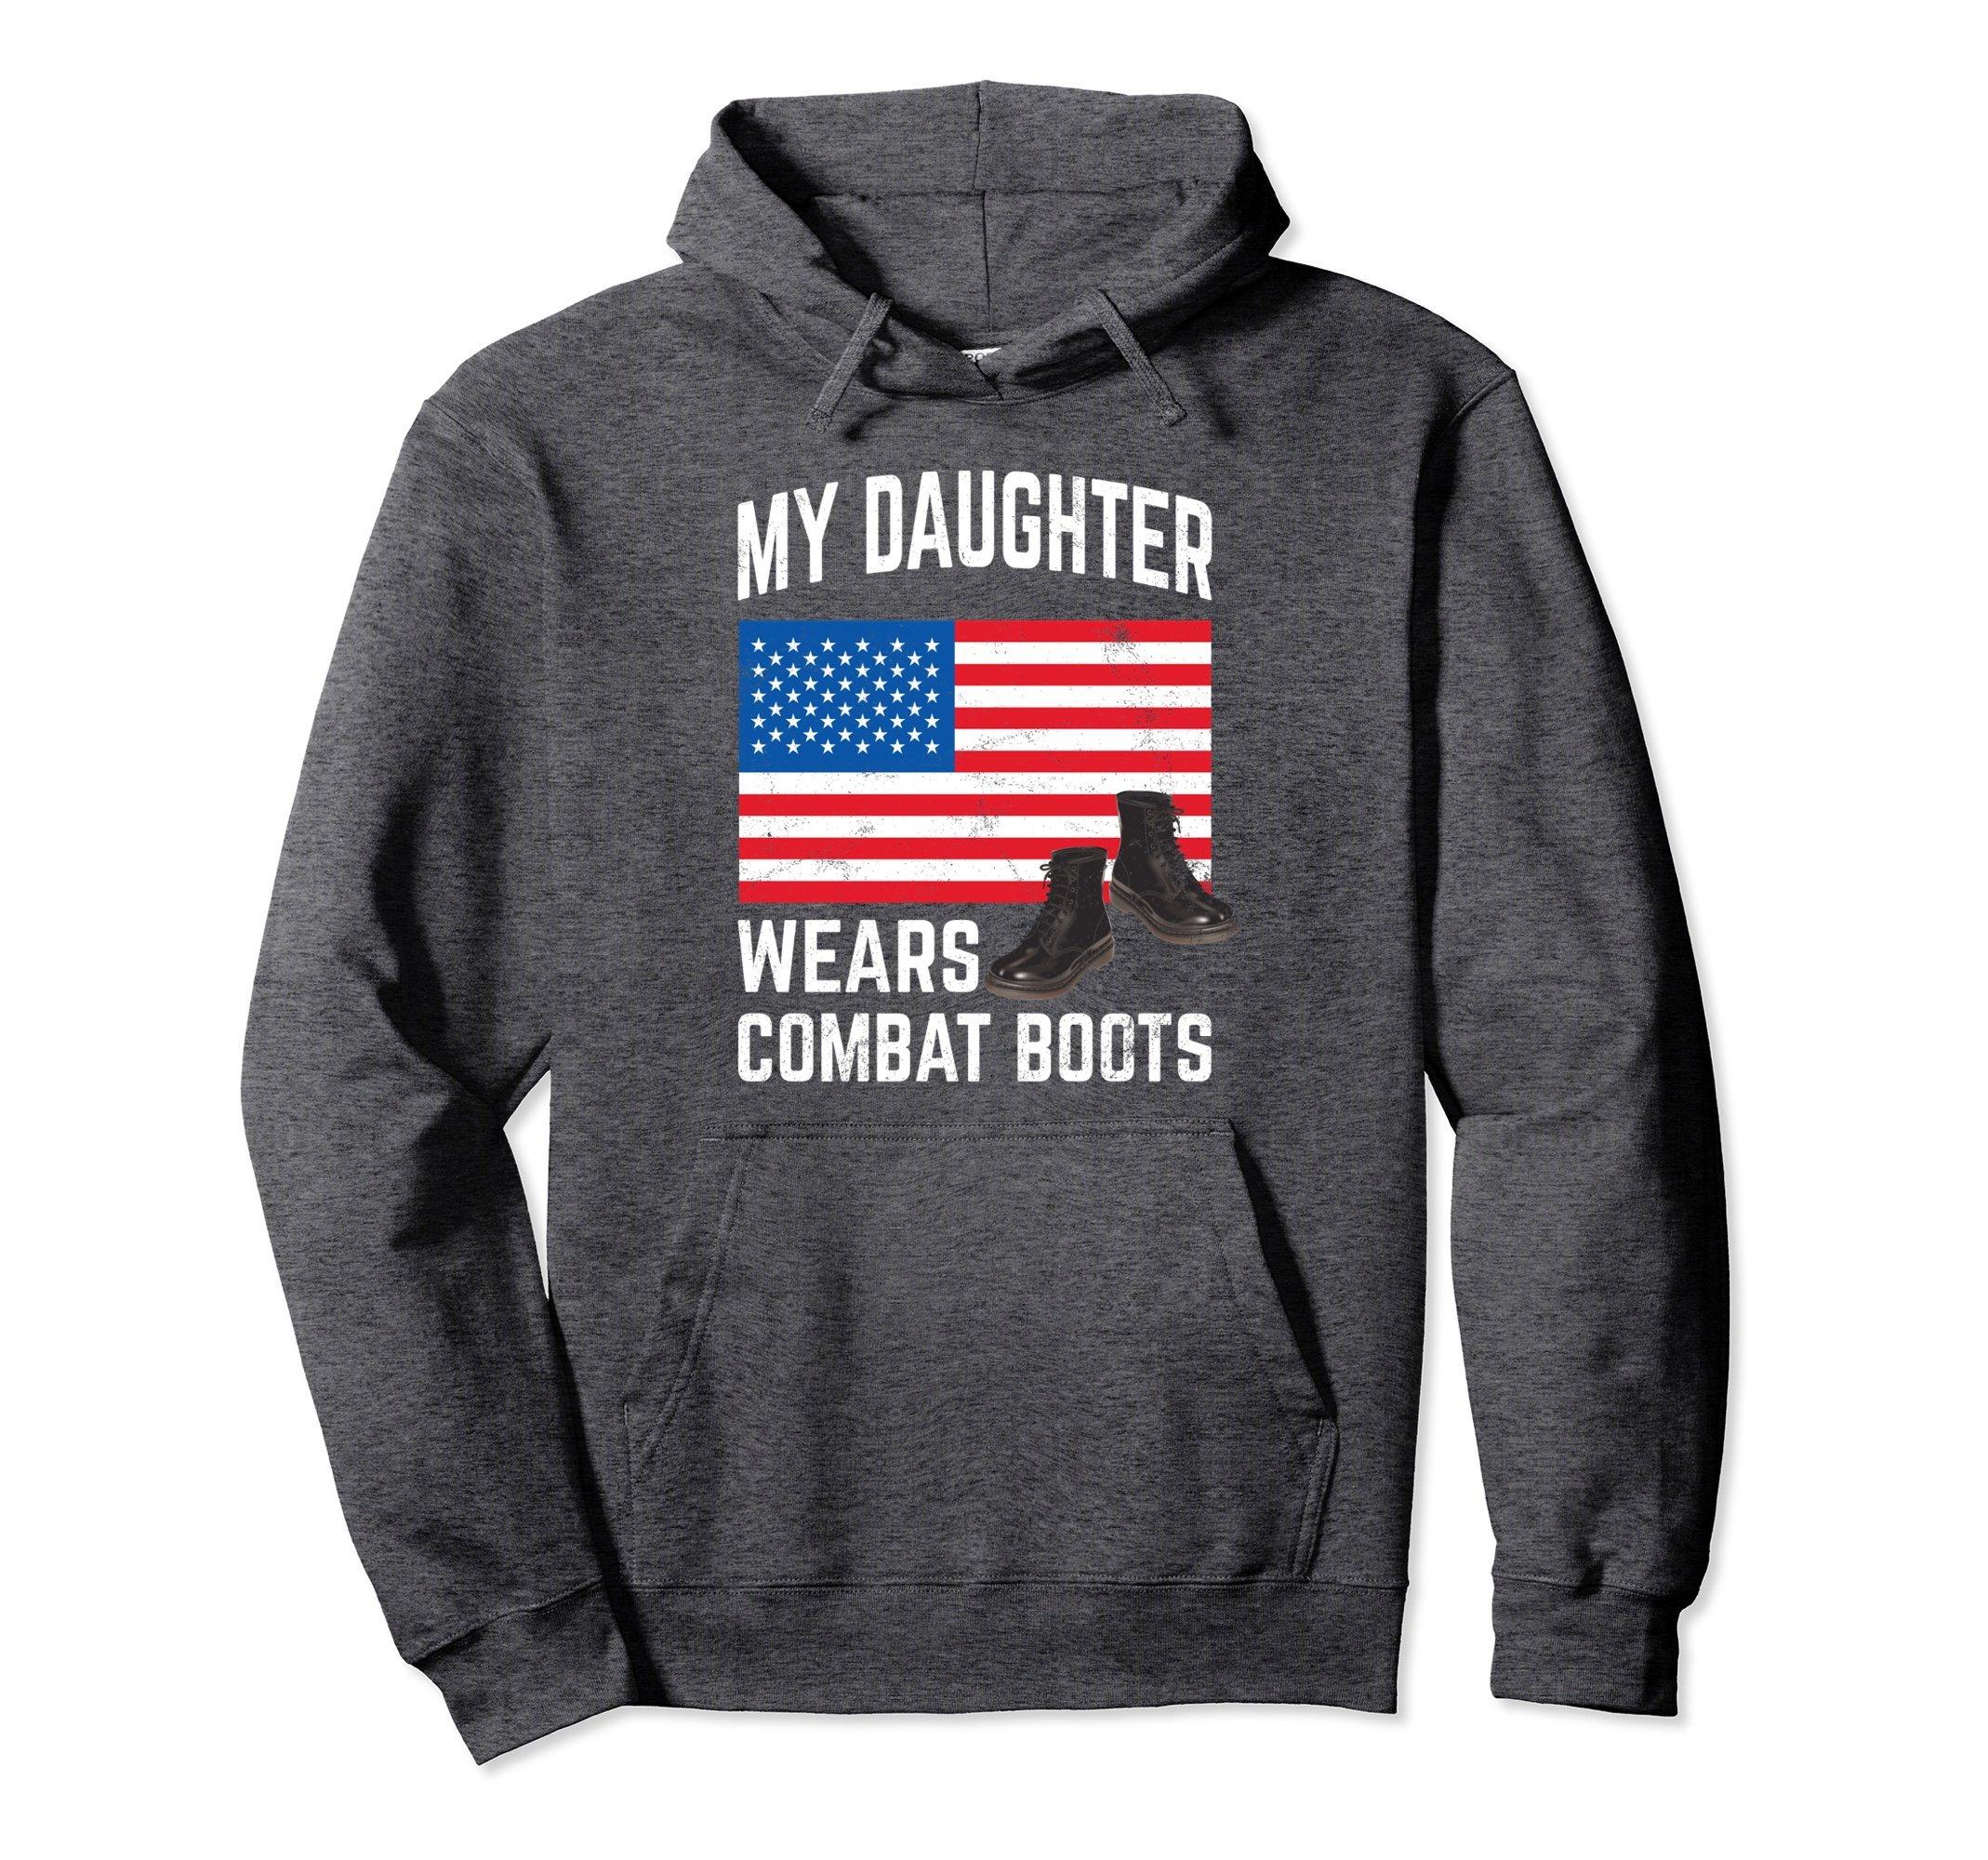 Unisex My Daughter Wears Combat Boots Hoodie Military Support XL: Dark Heather